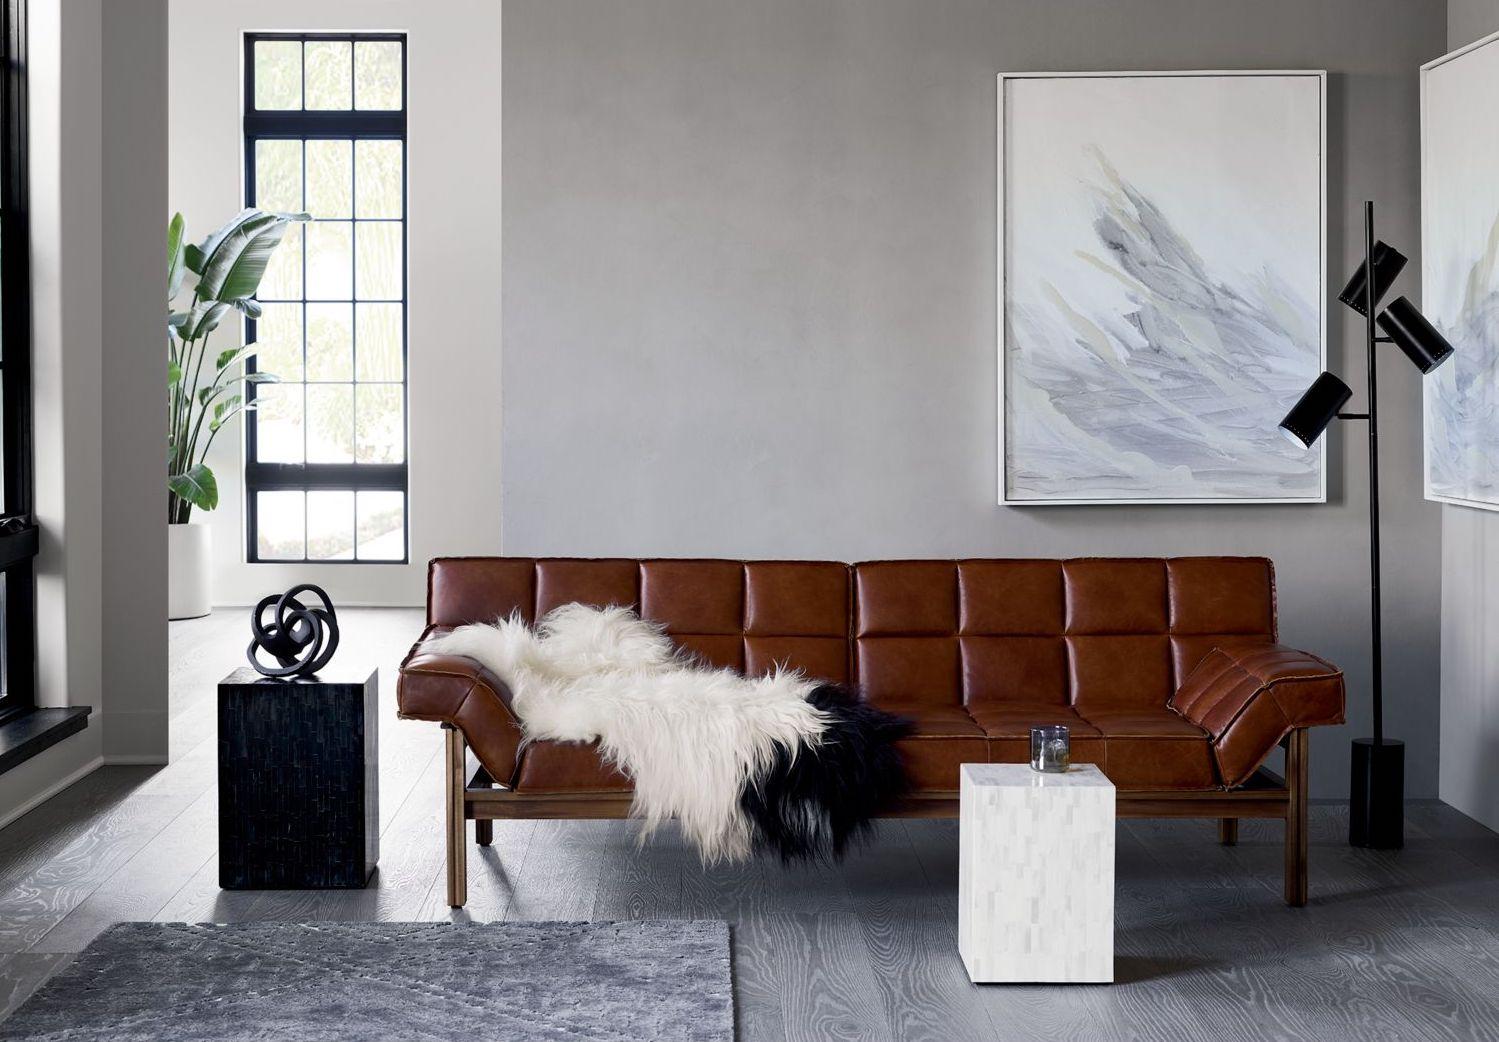 Black knot sculpture in a modern room